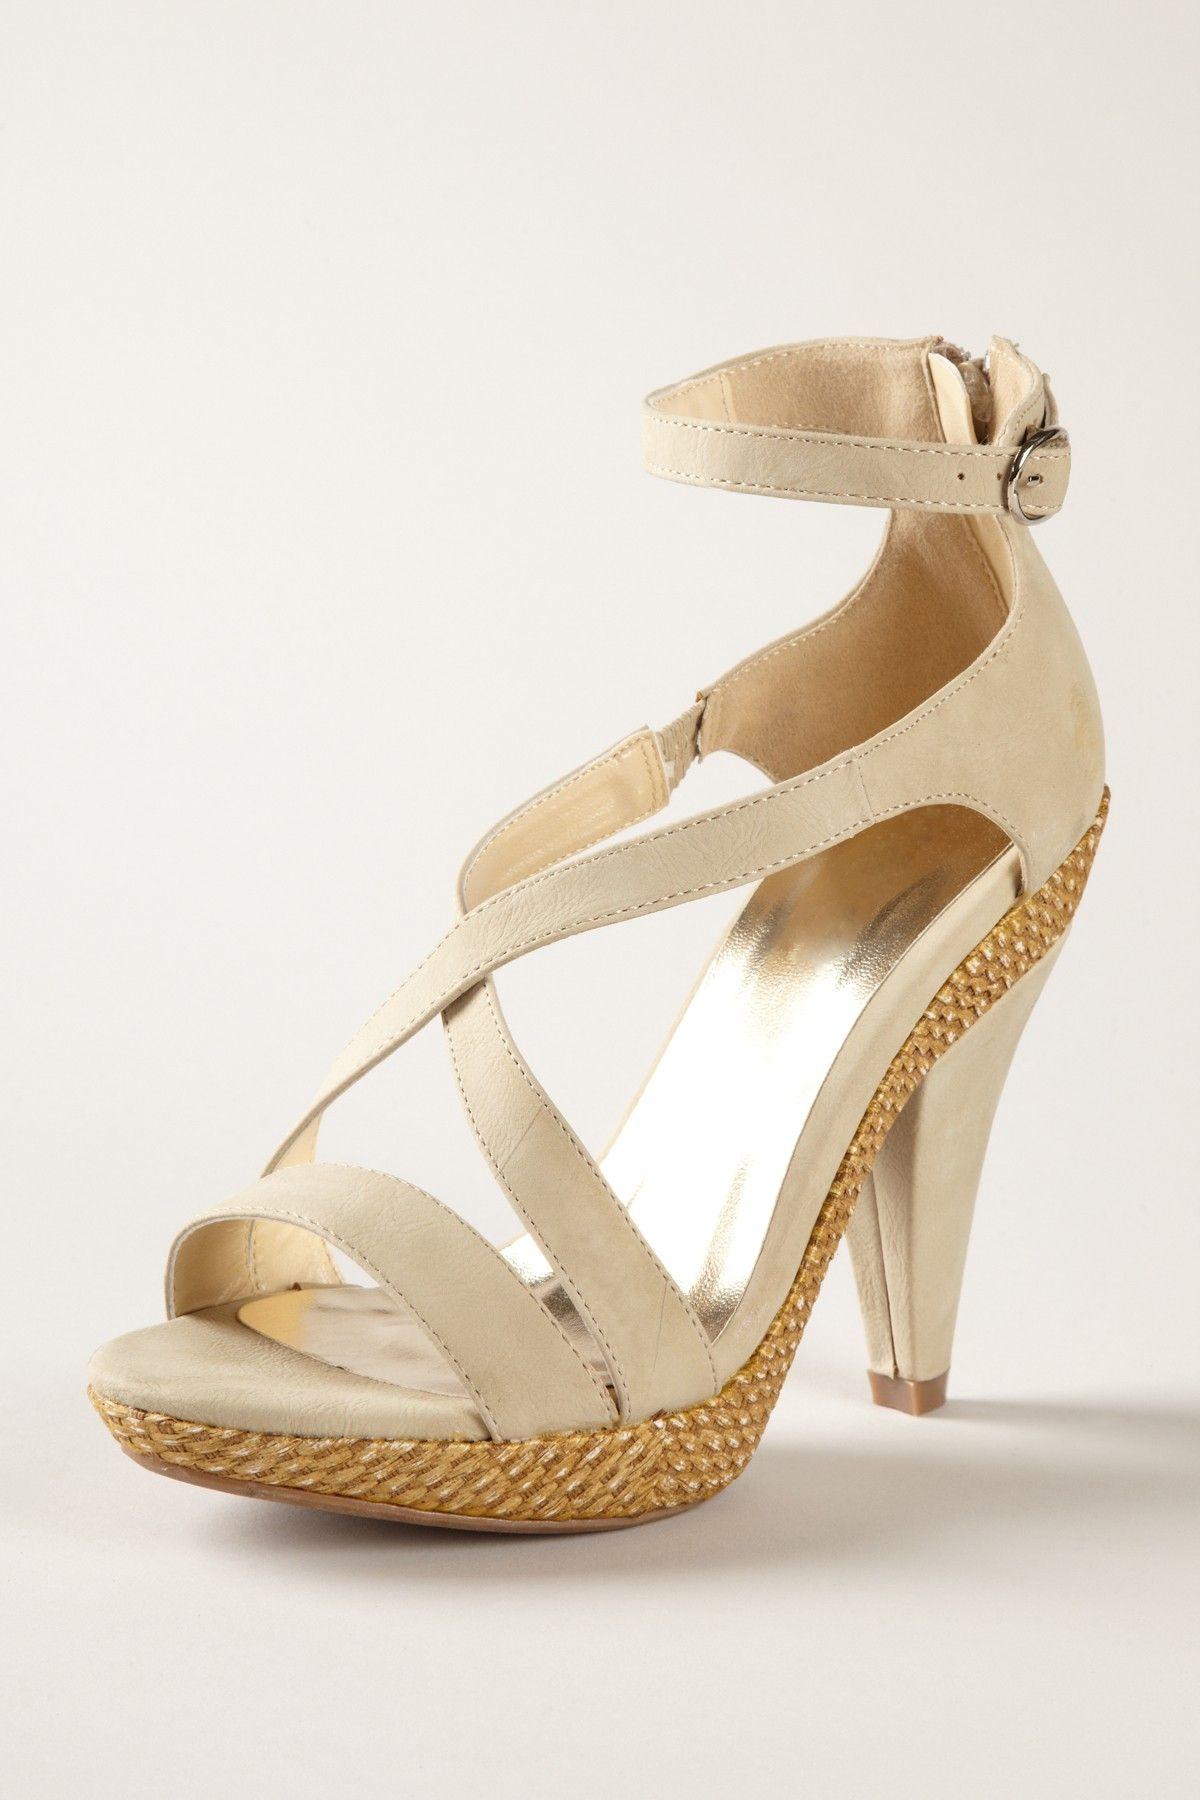 Bucco Gelasia Sandal